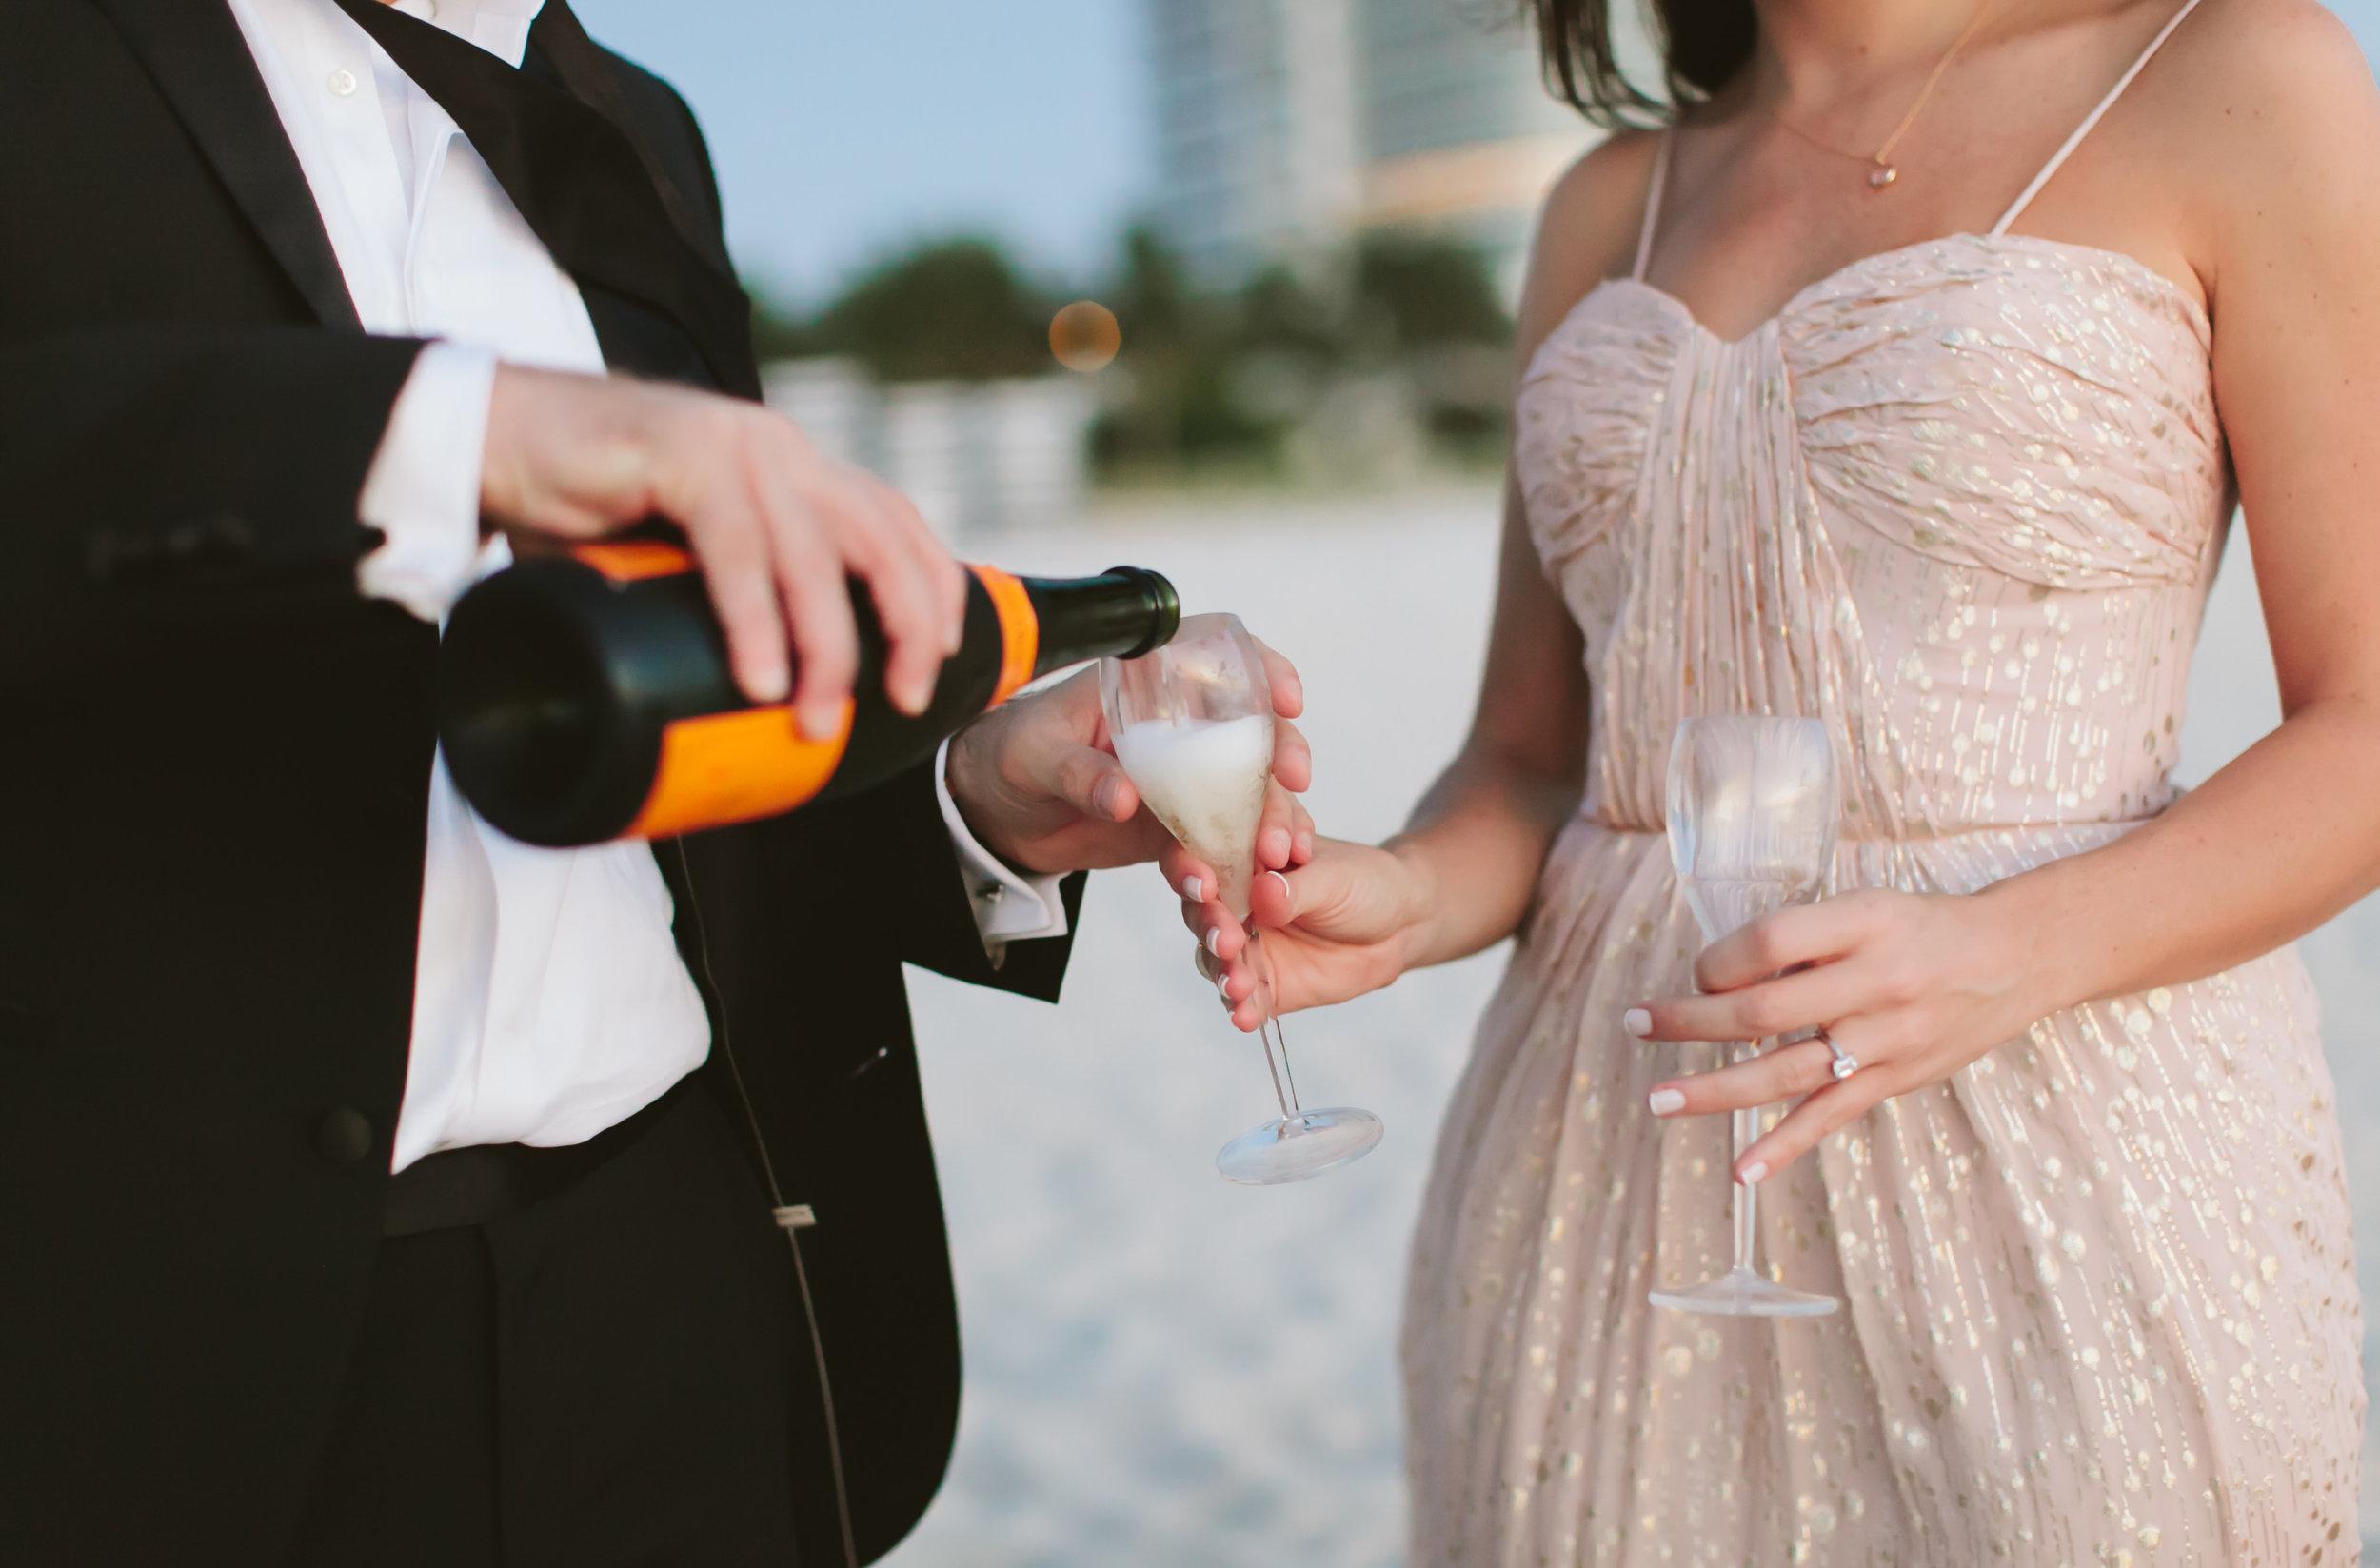 Meli + Mike South Pointe Park South Beach Miami Engagement Shoot6.jpg